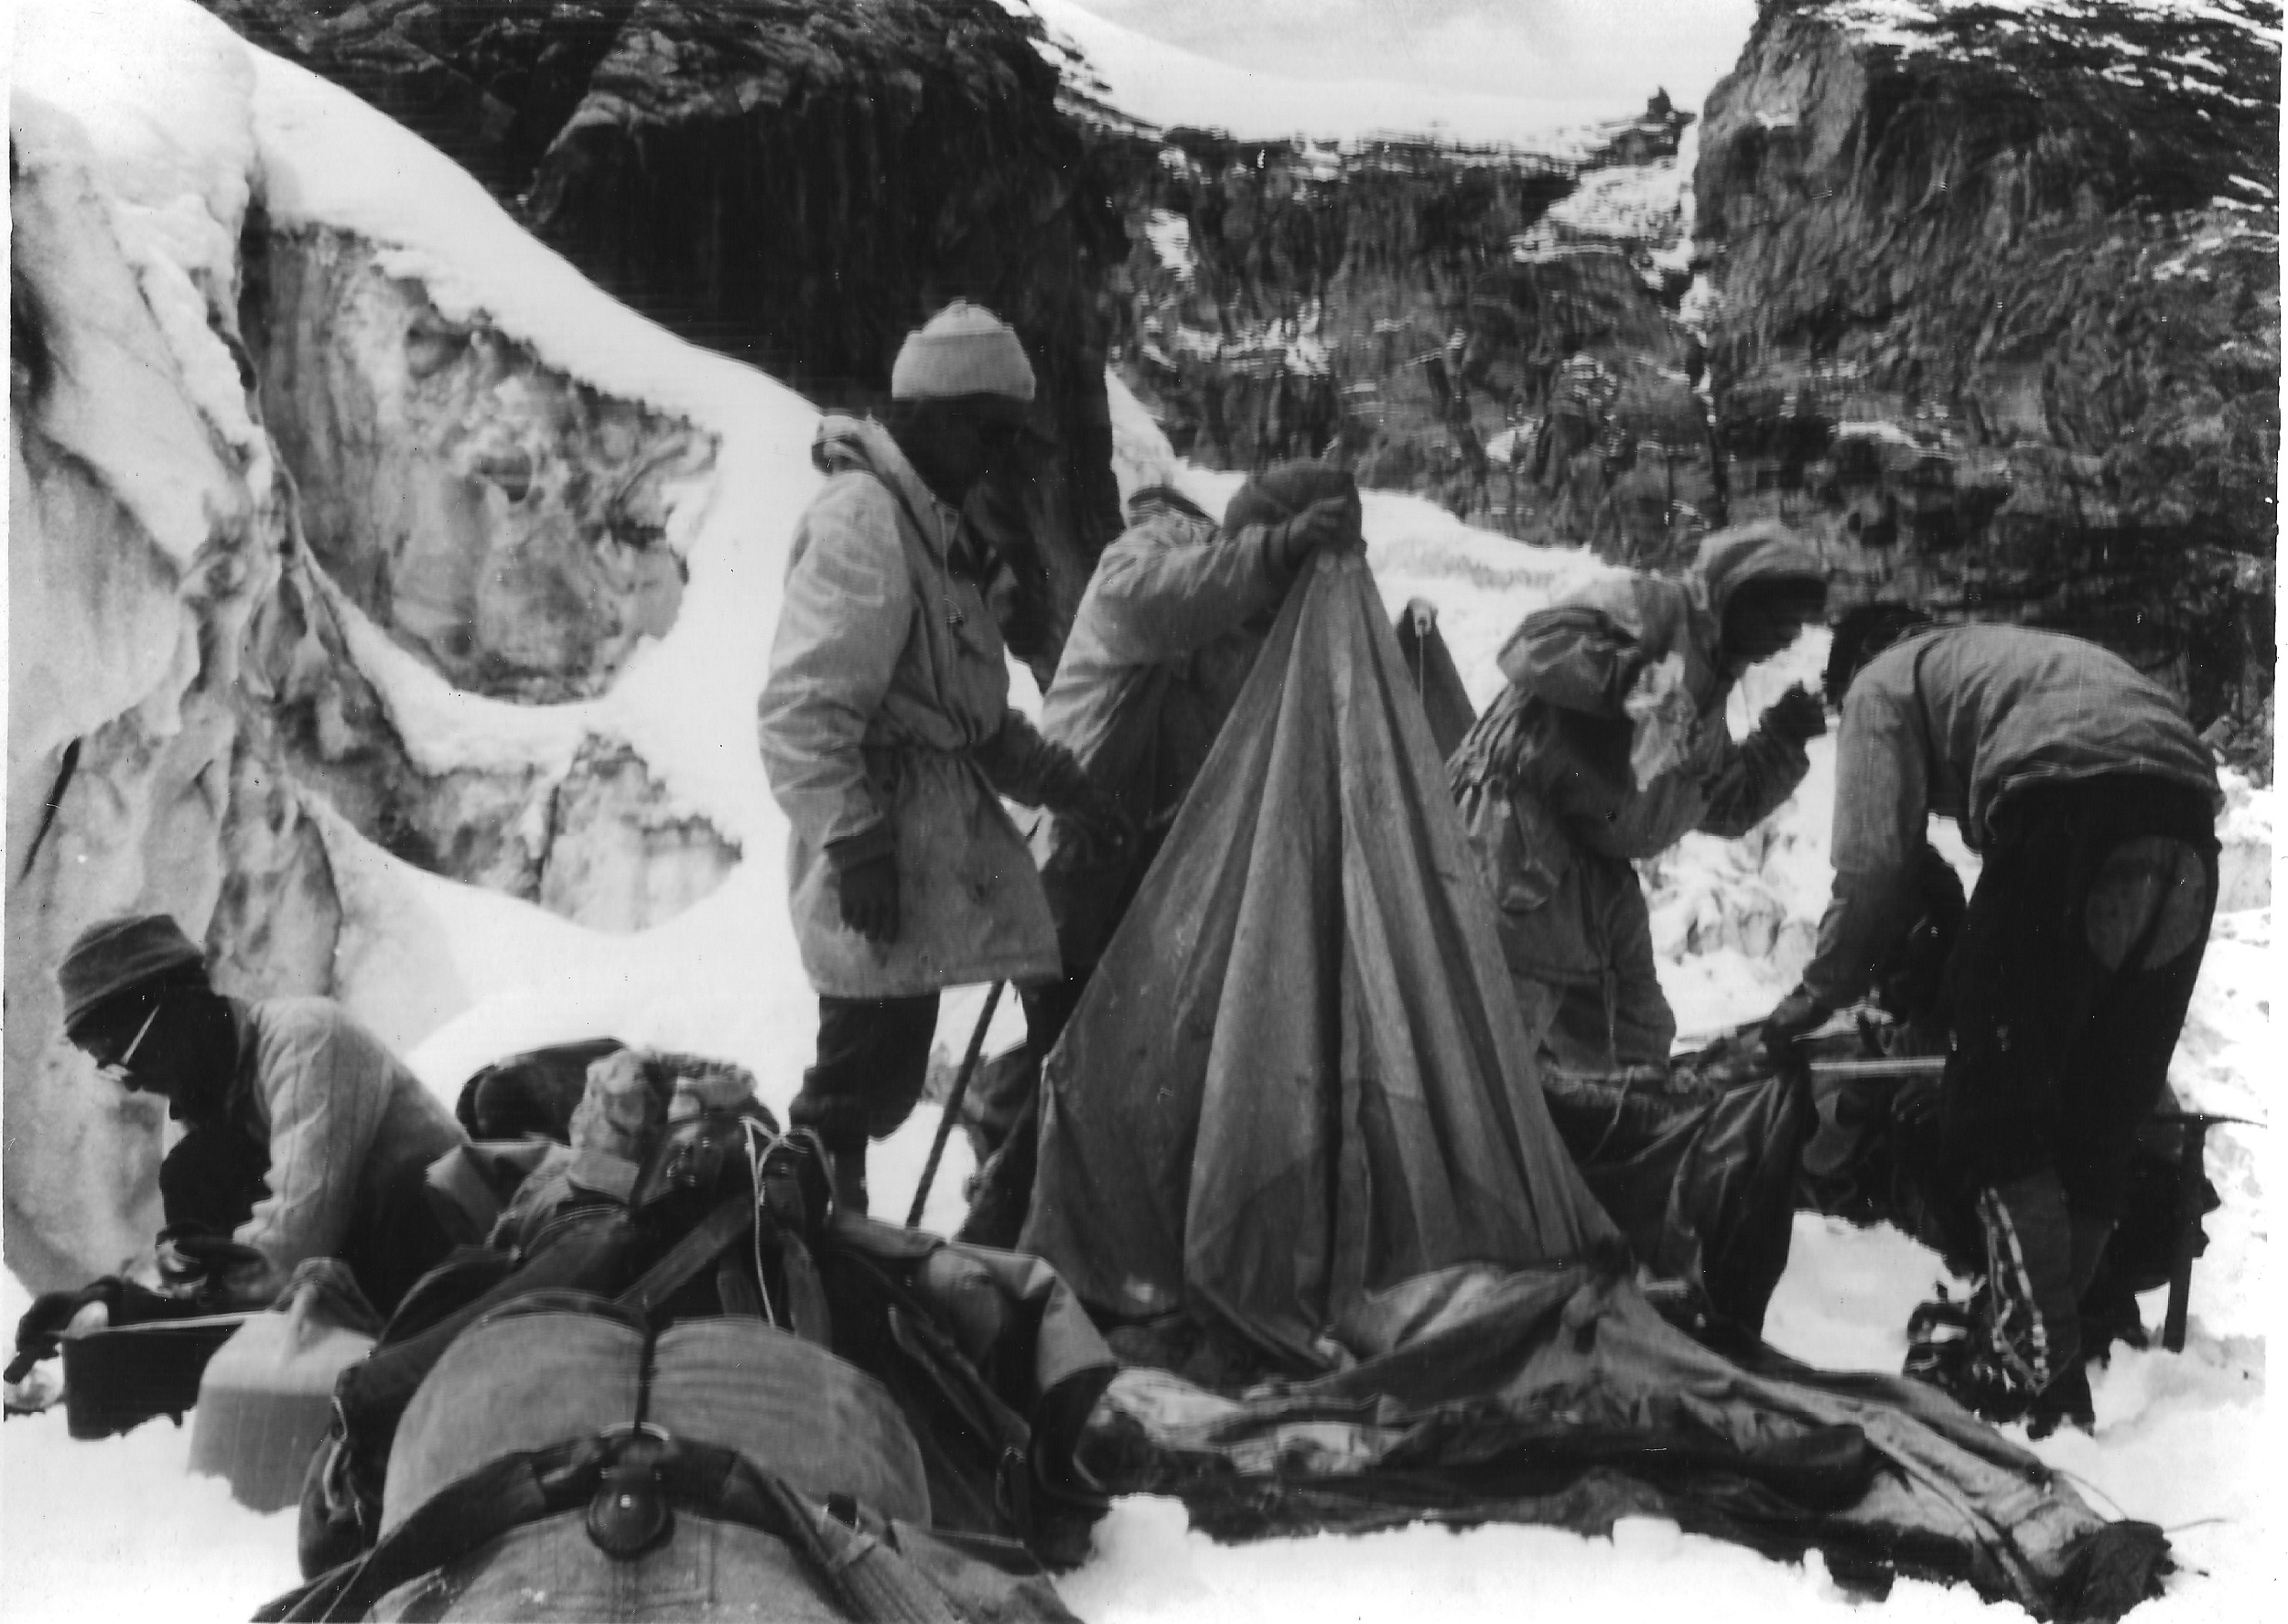 Setting up Camp II at 17,000 feet in Lalana [image by: Sudipta Sengupta]